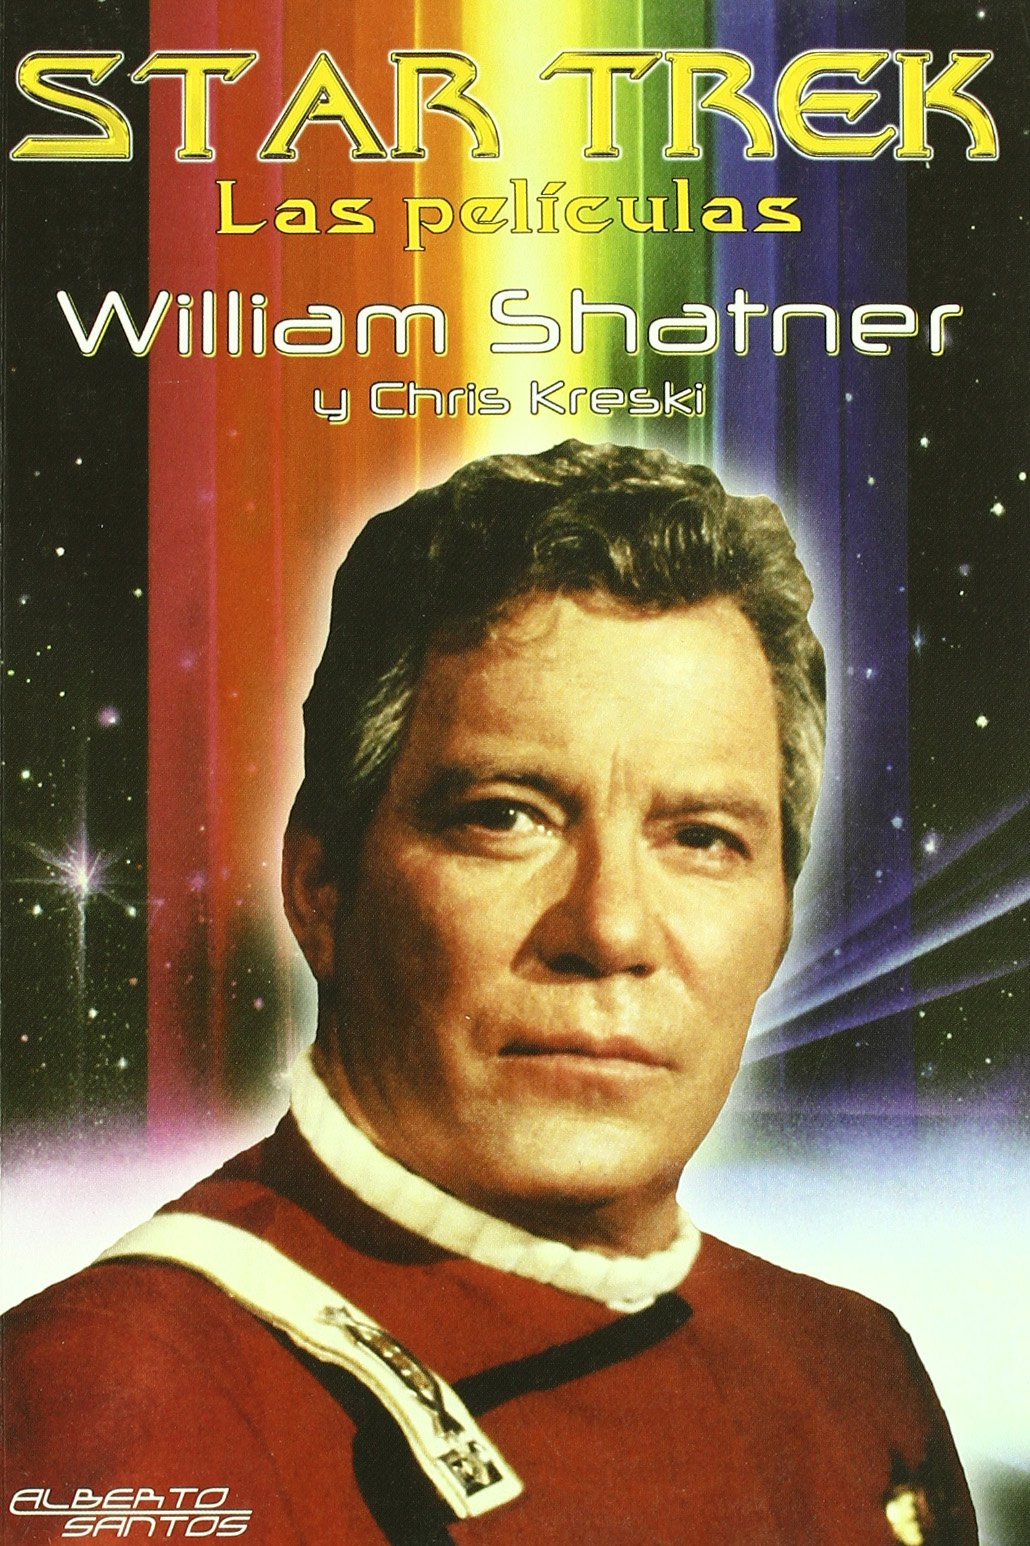 Star Trek: Las películas